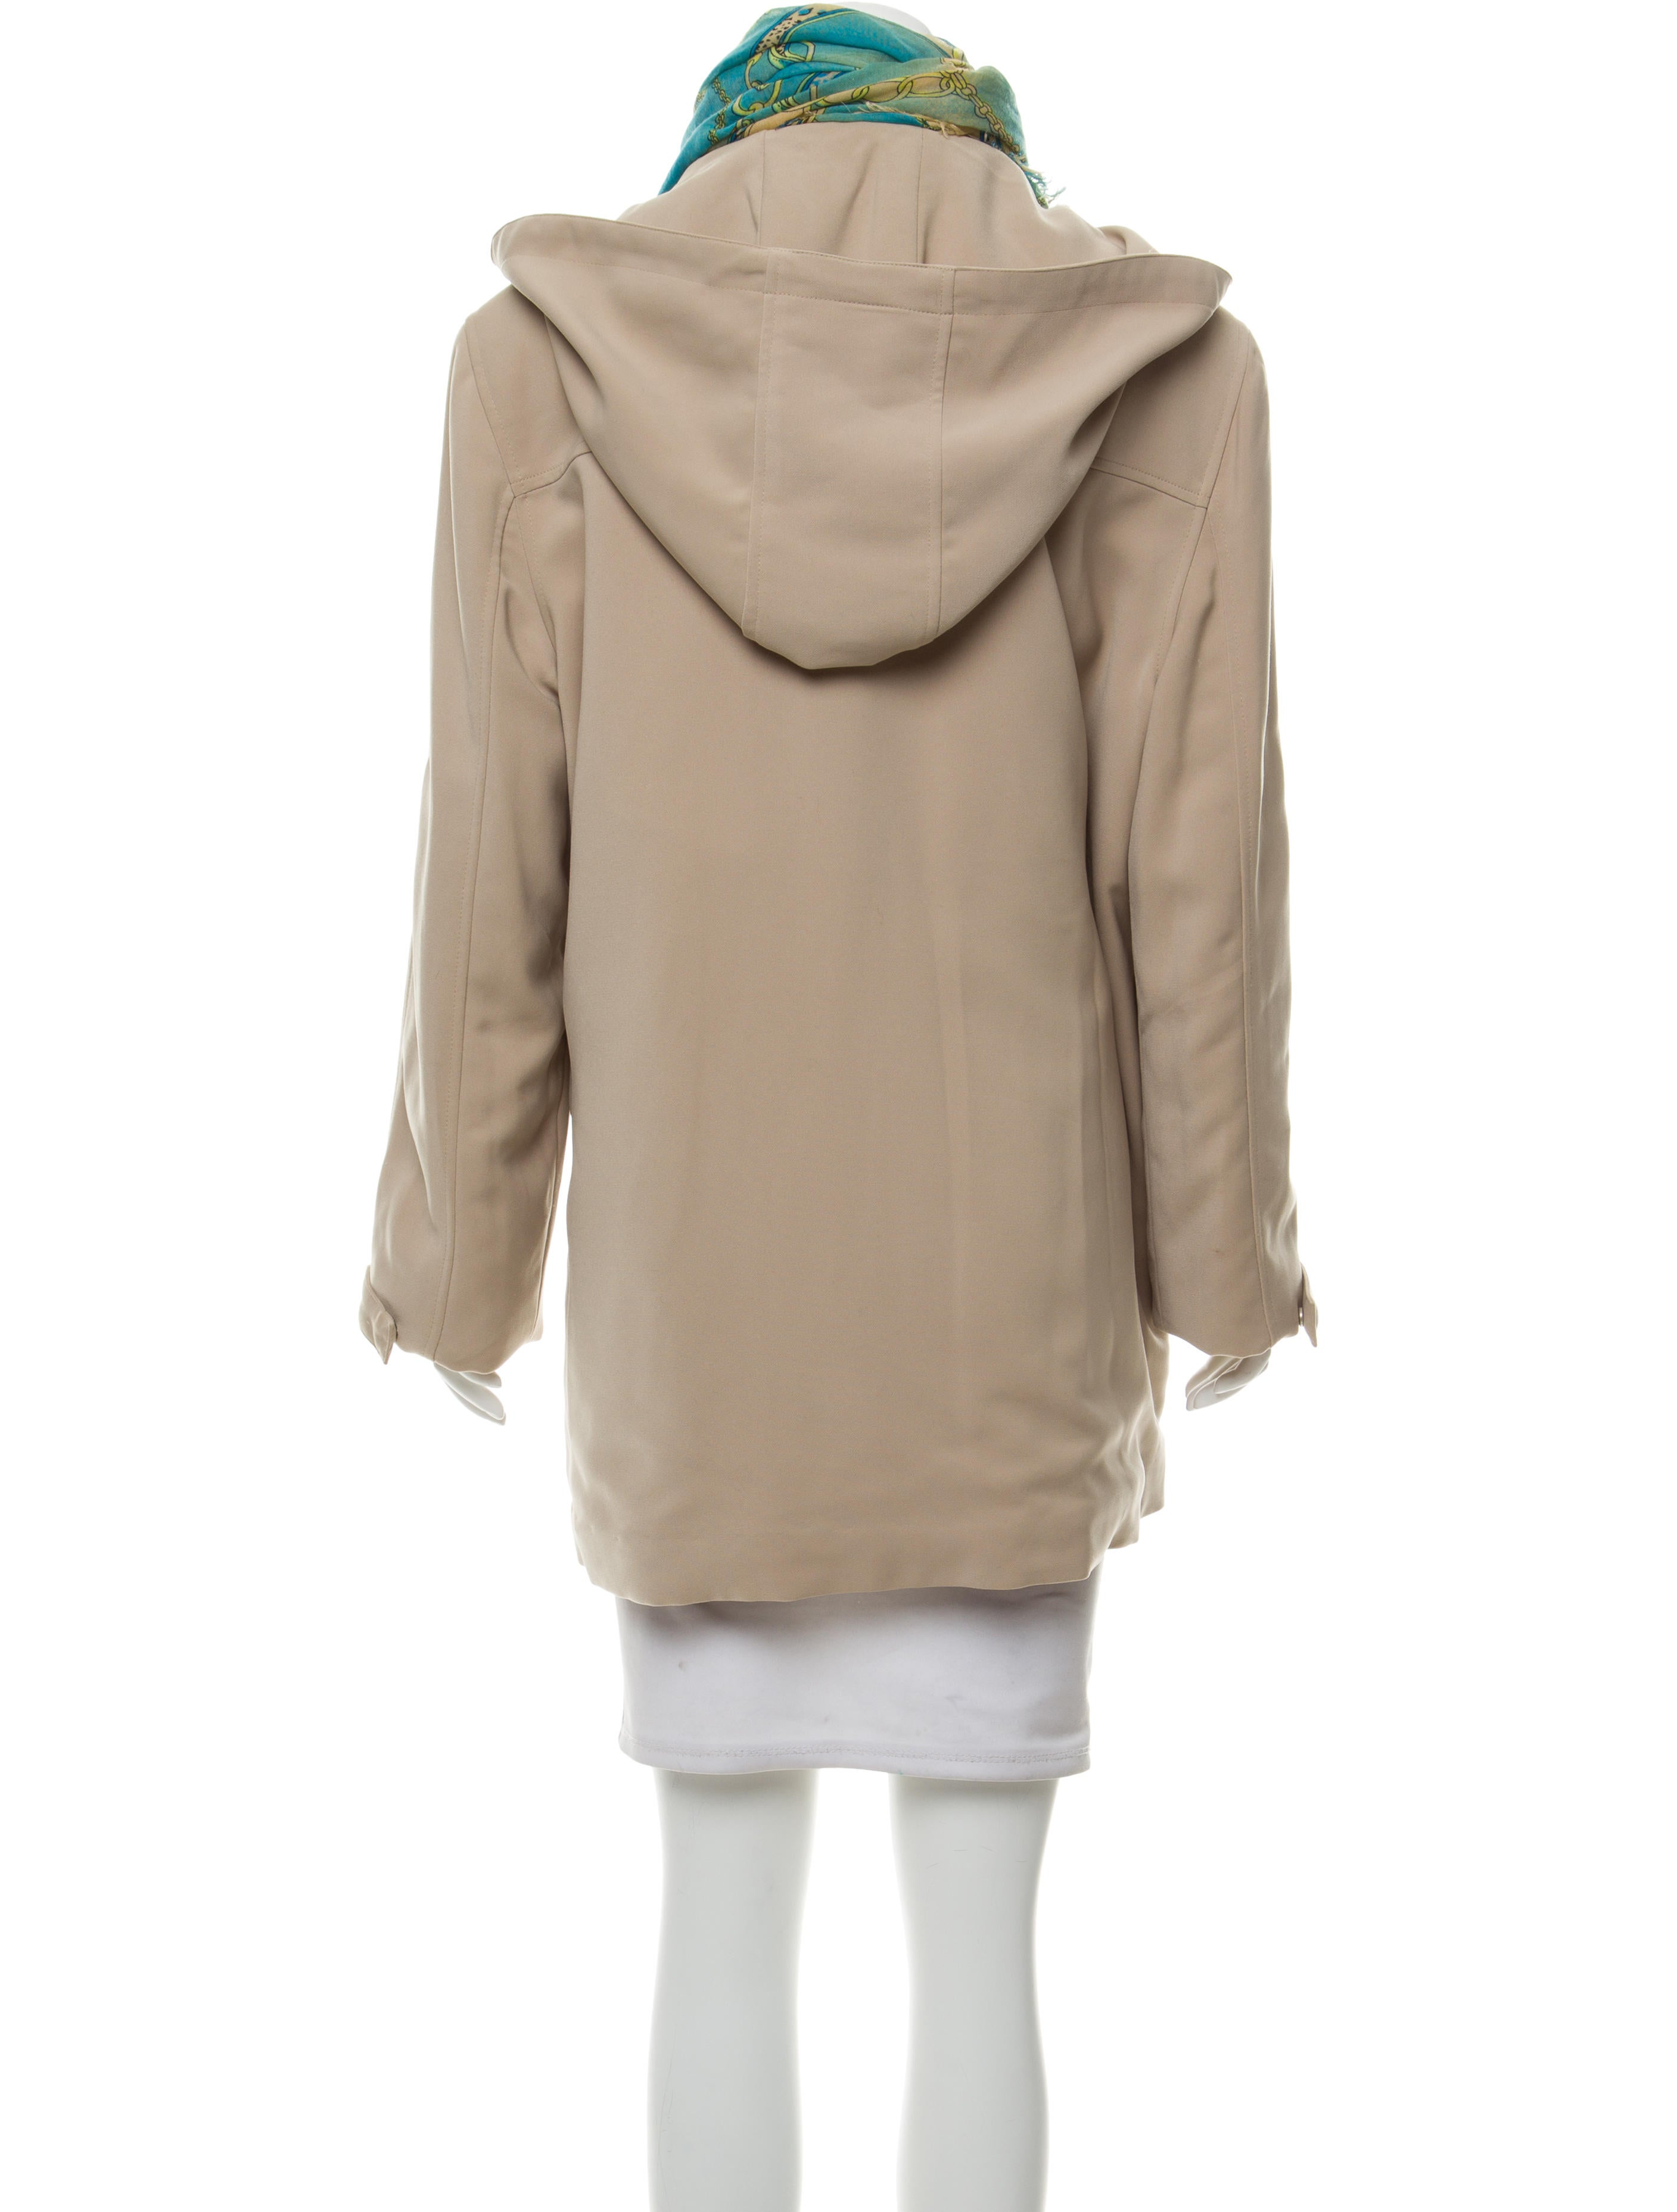 calvin klein hooded zip up jacket clothing wyl20481. Black Bedroom Furniture Sets. Home Design Ideas